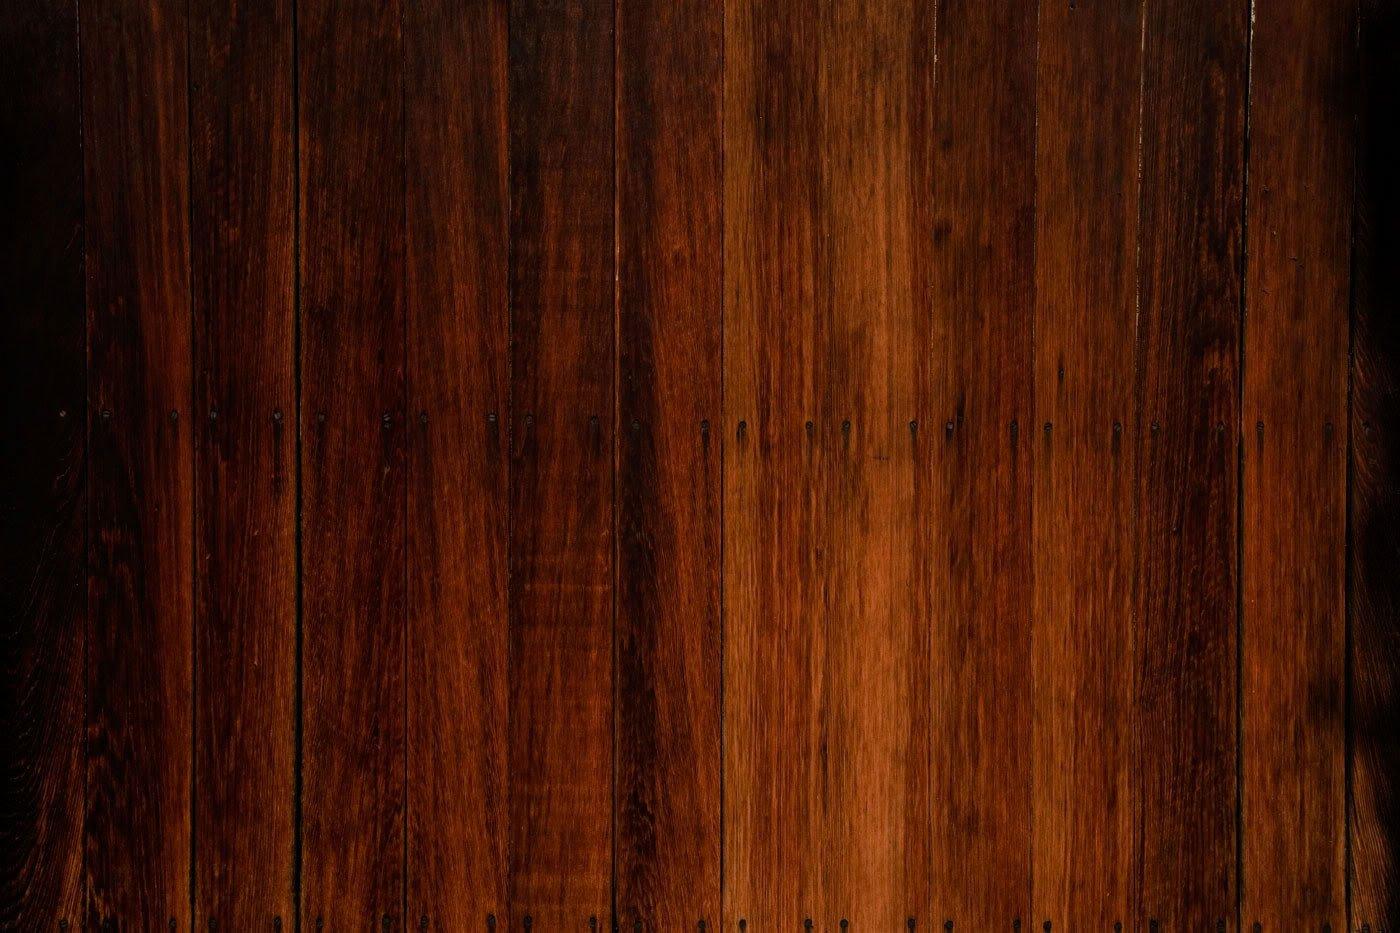 Wood Panel Bg Background Wallpaper 1400x933